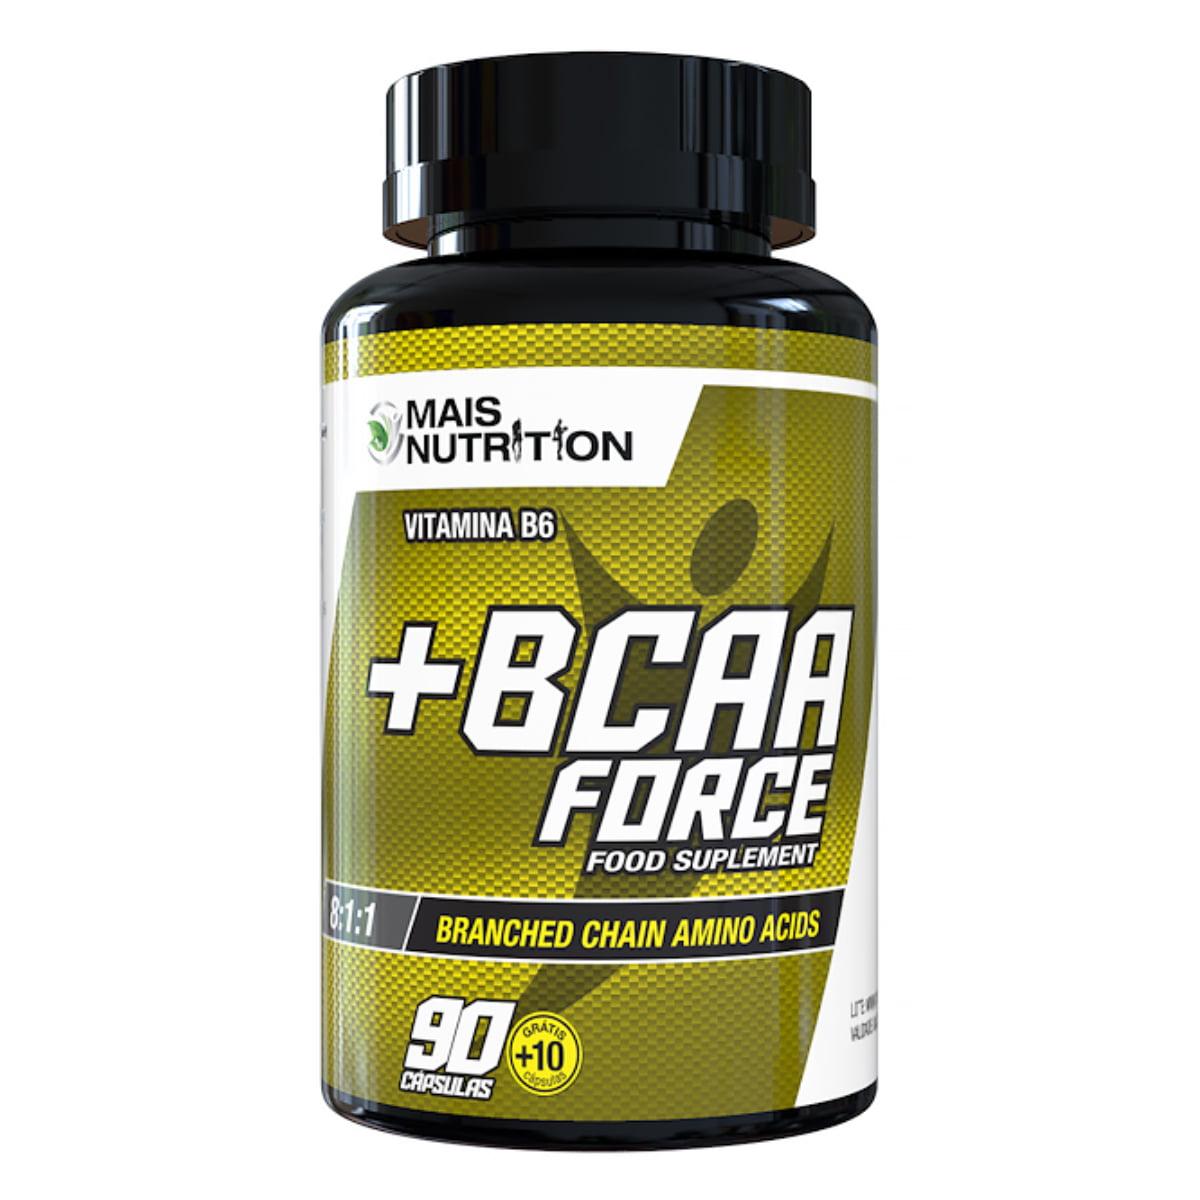 8 Whey Blend Refil 2kg + 4 BCAA Force + 4 Fynatte